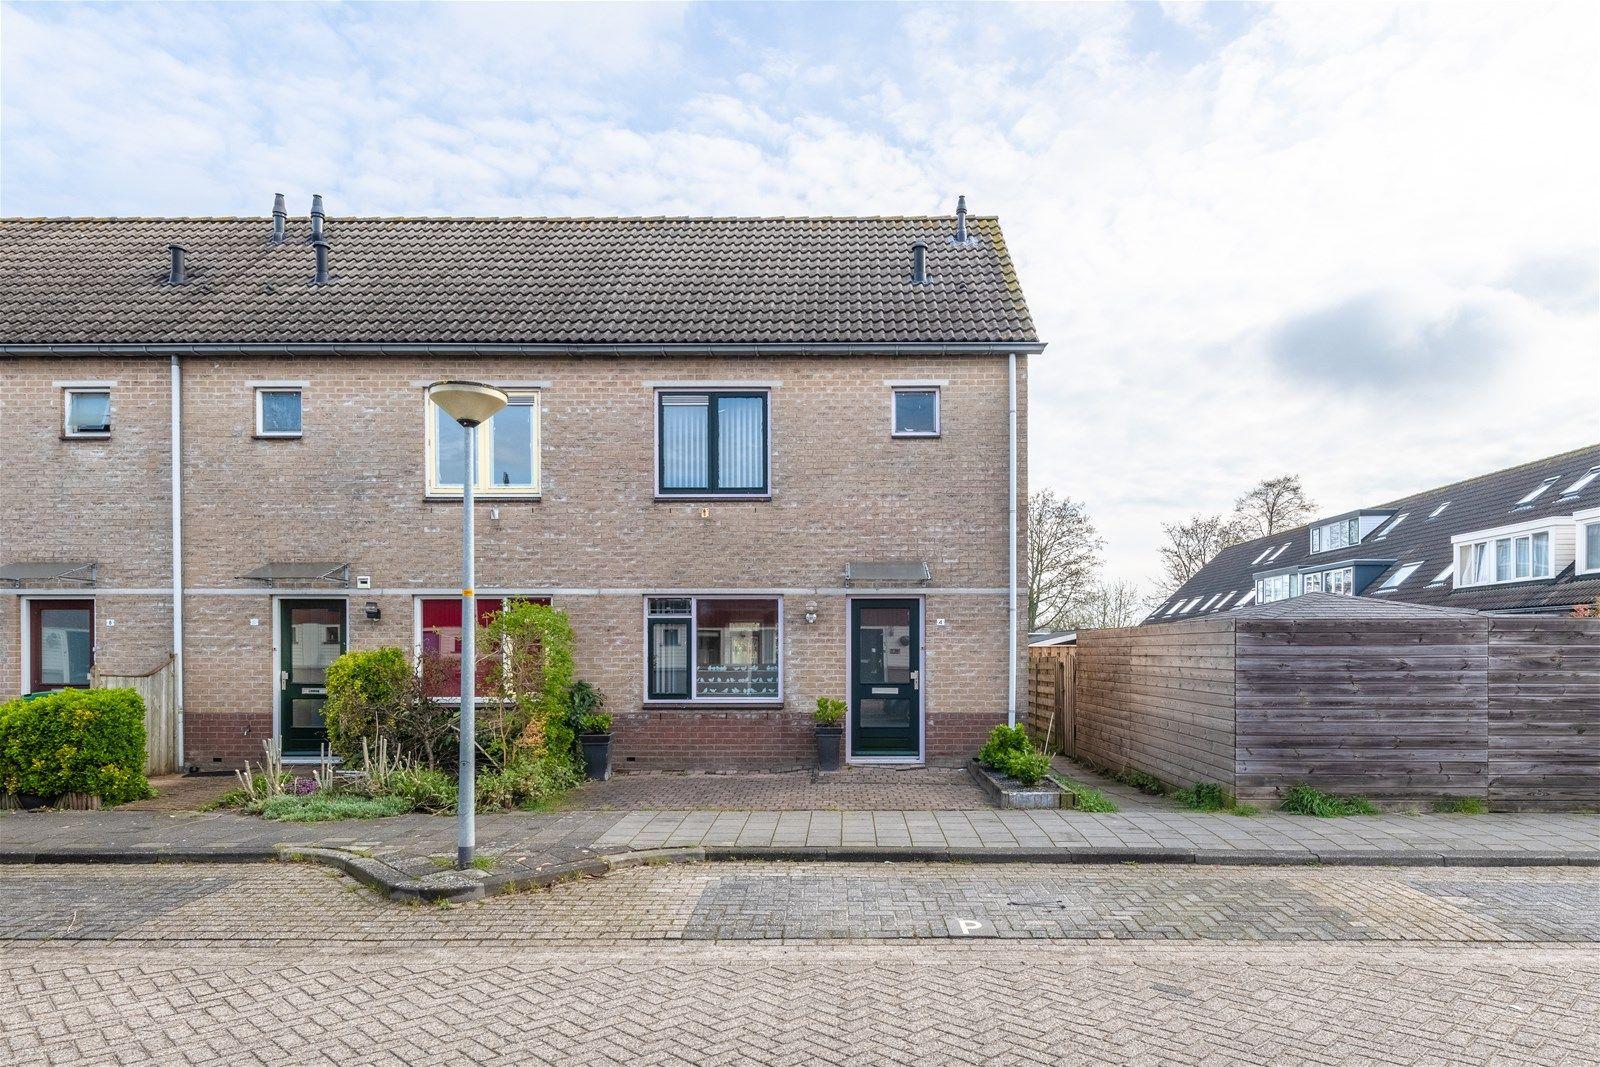 Steven Vennecoolstraat 4, Almere